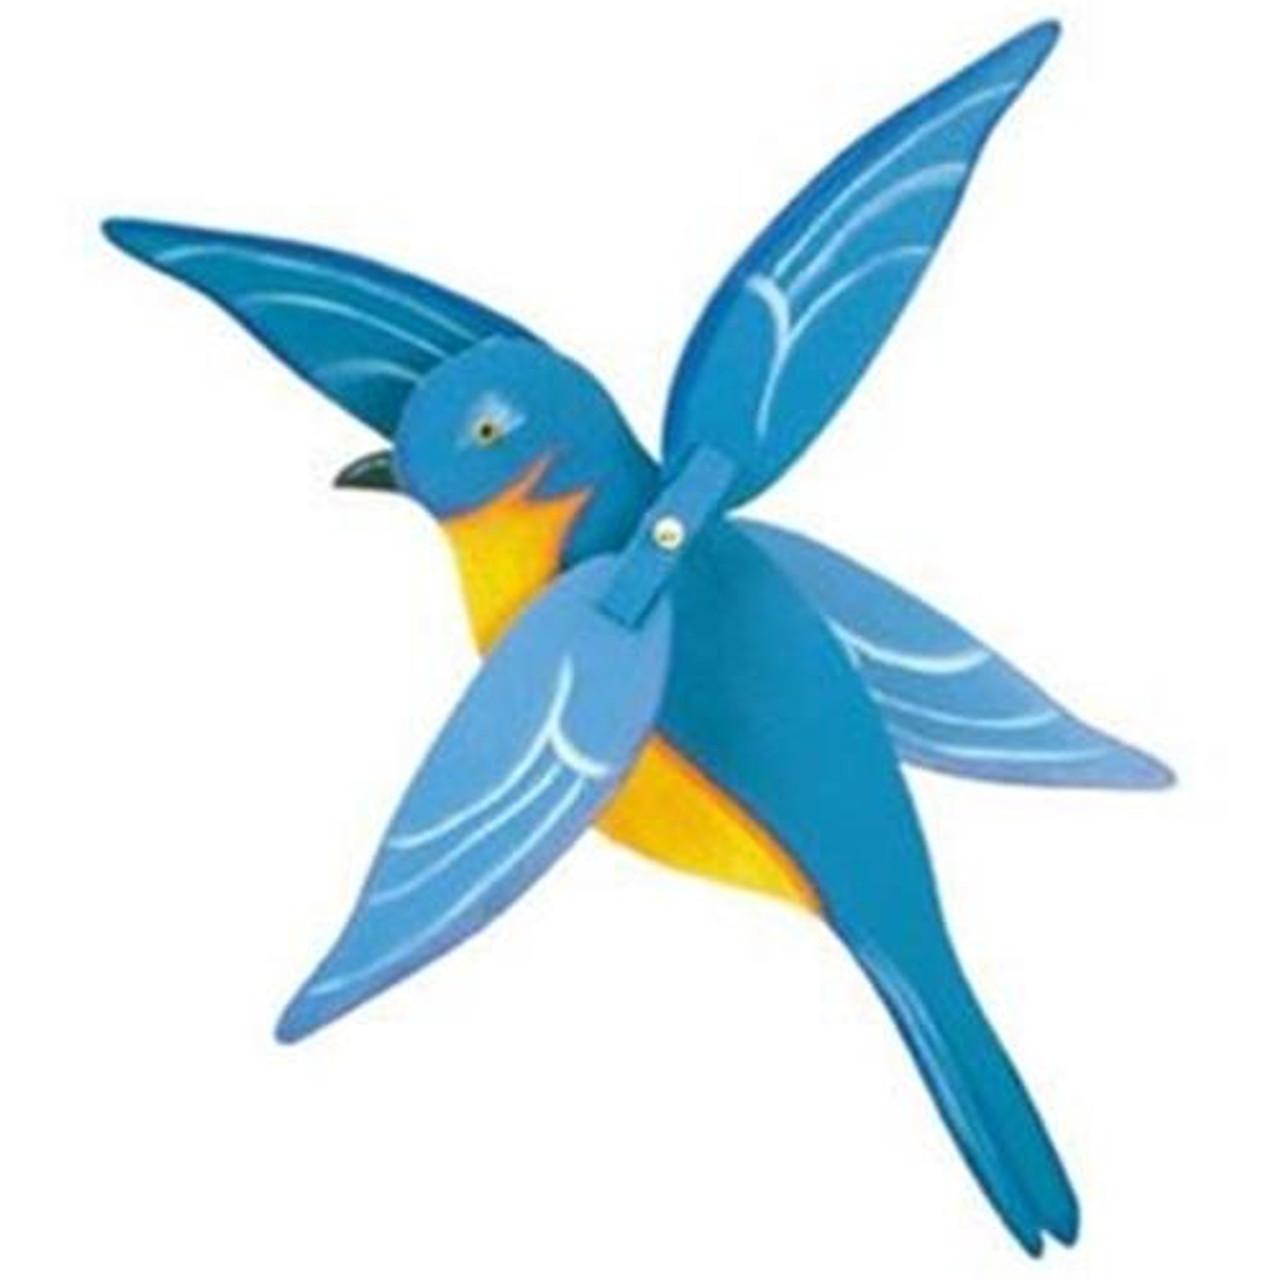 Cherry Tree Toys Bluebird Whirligig Plan